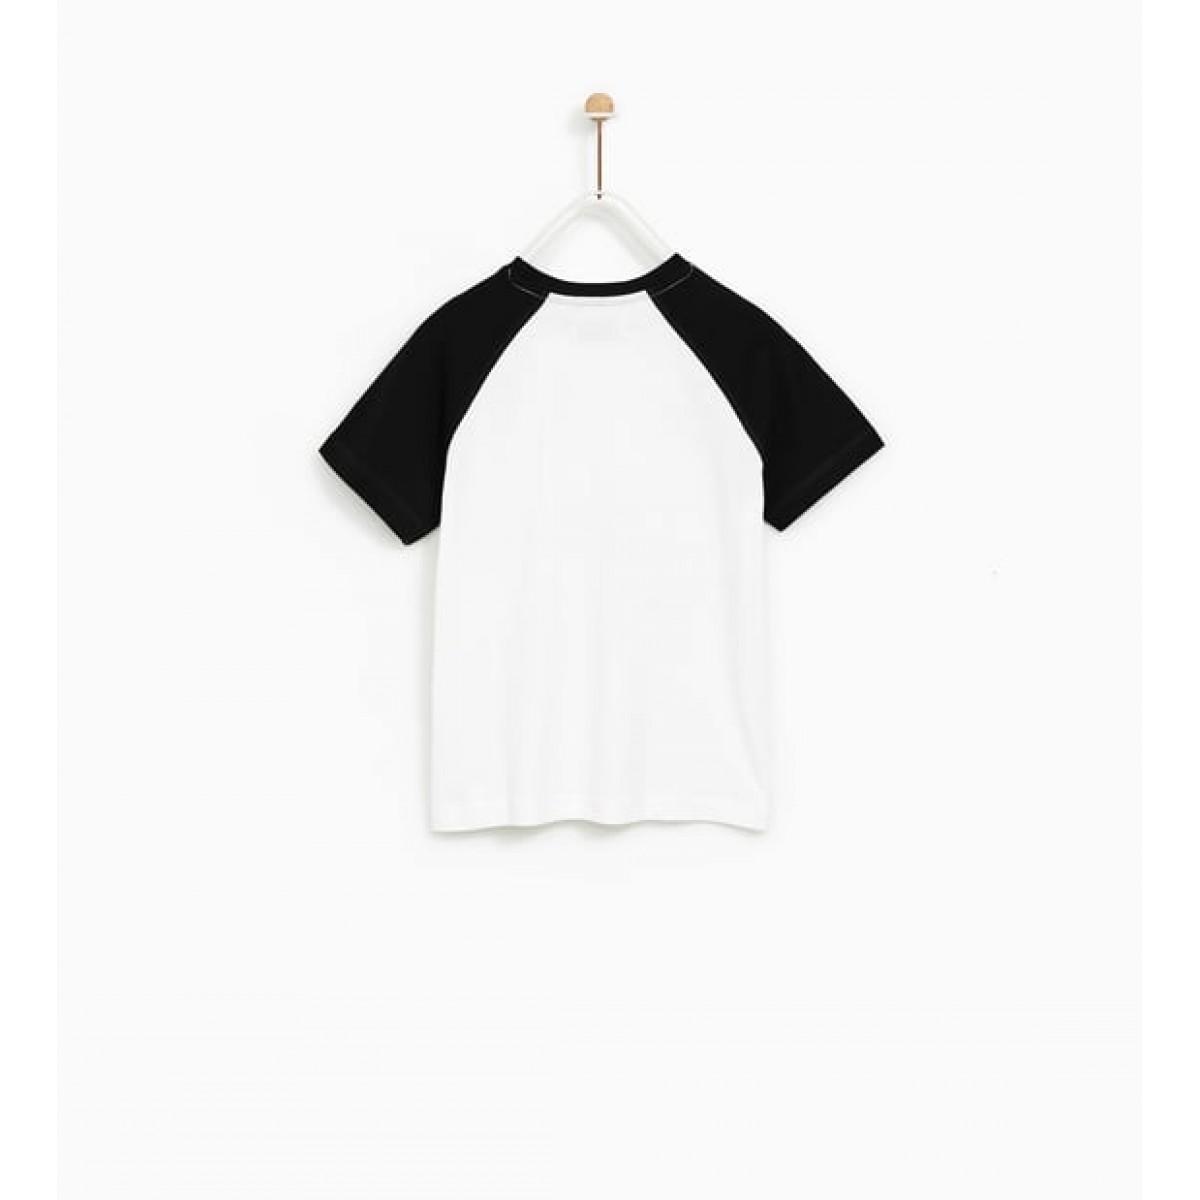 Zara Pic Of The Day' Slogan T-Shirt